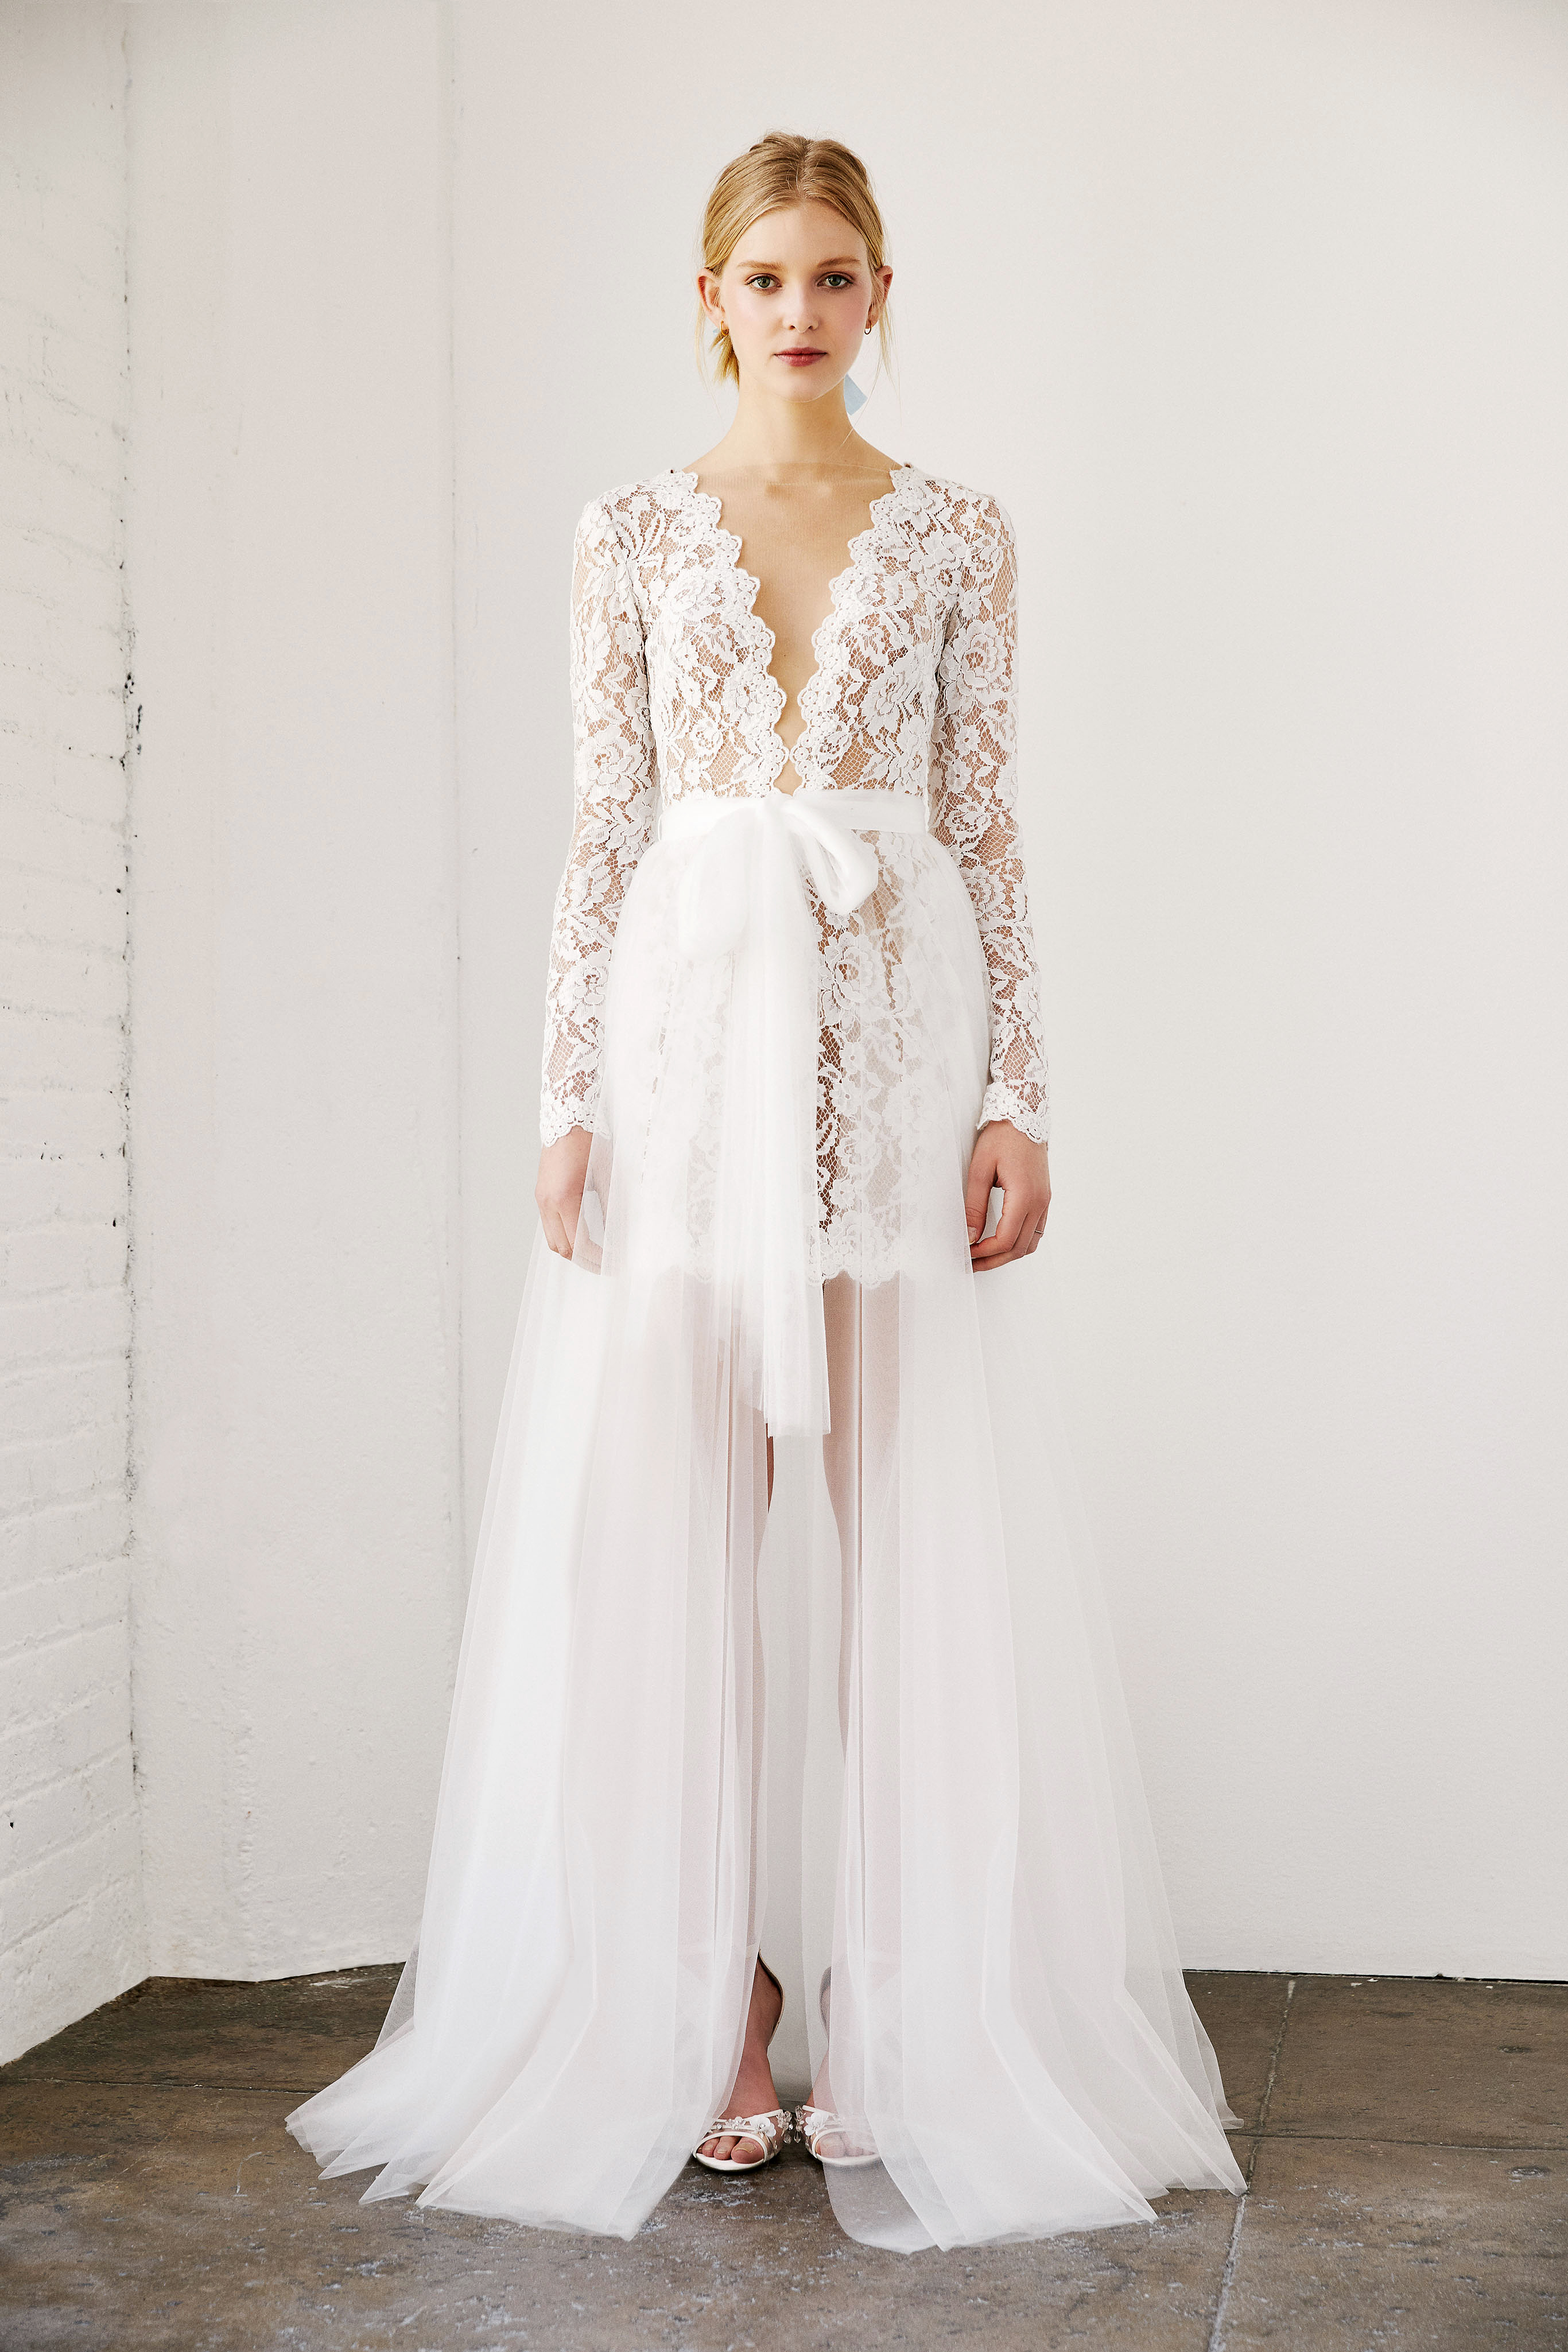 tadashi shoji wedding dress spring 2019 deep v long sleeves lace layered skirt